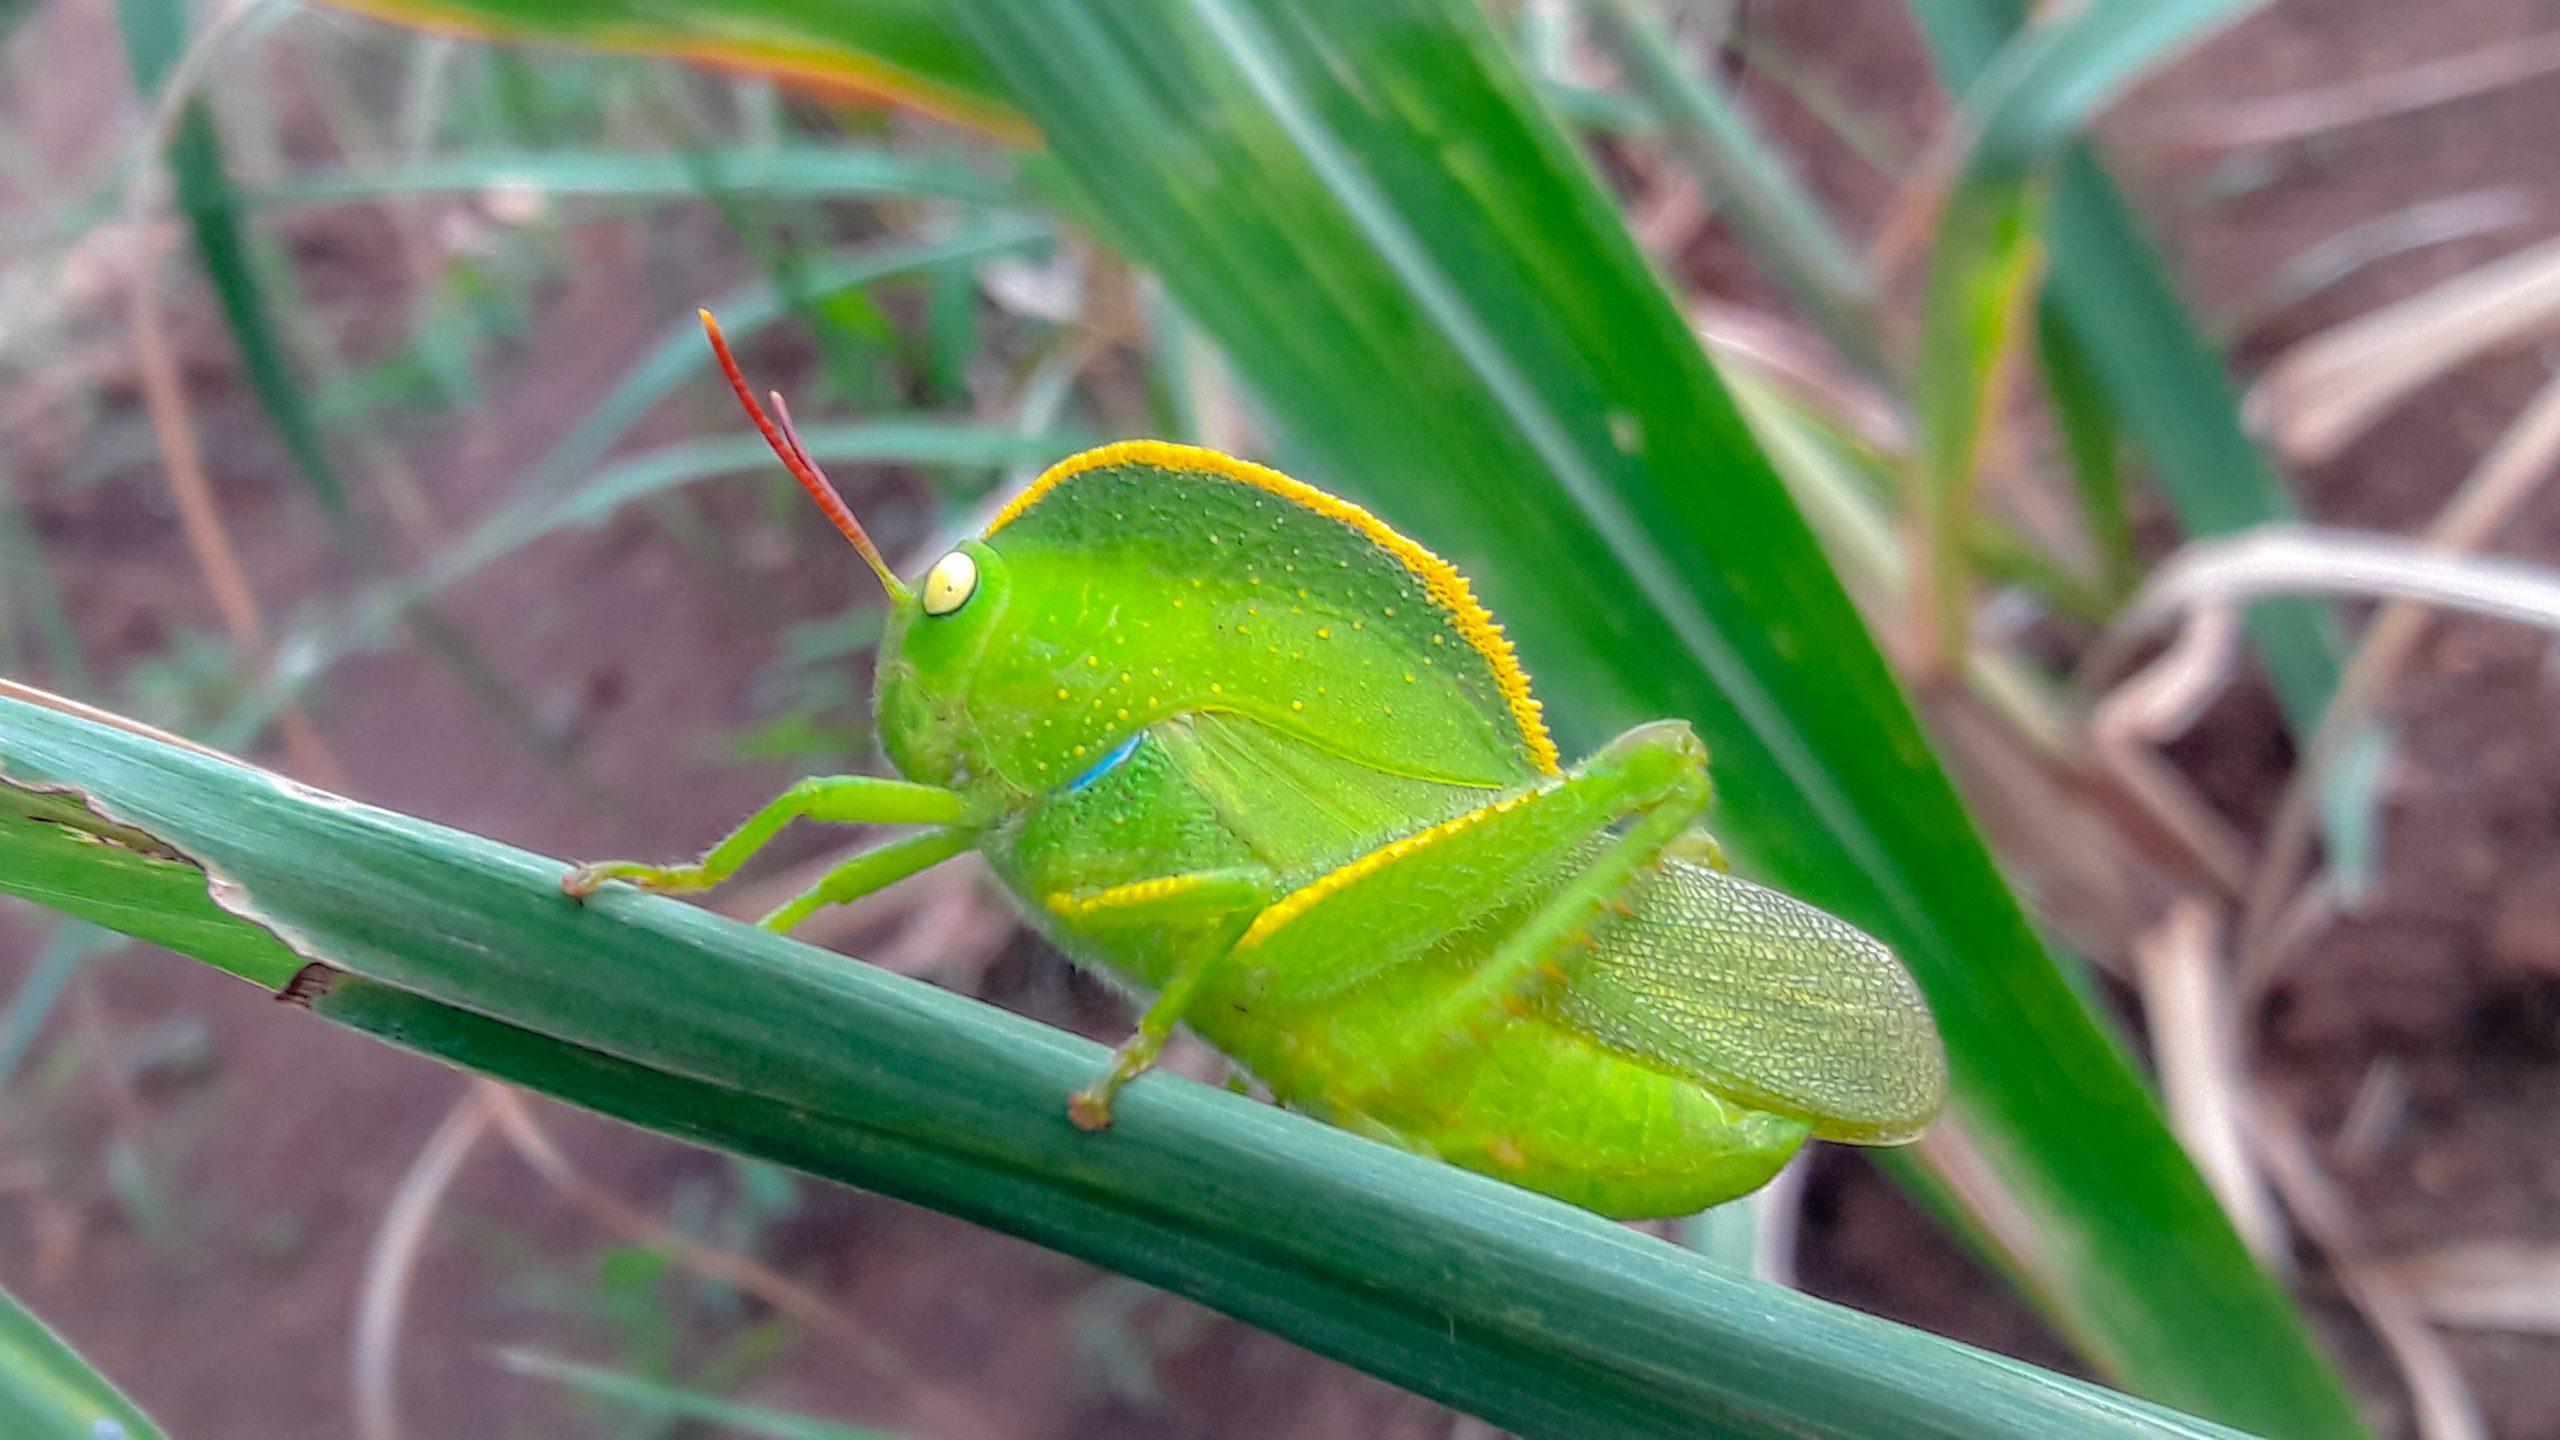 Grasshopper on plant leaf